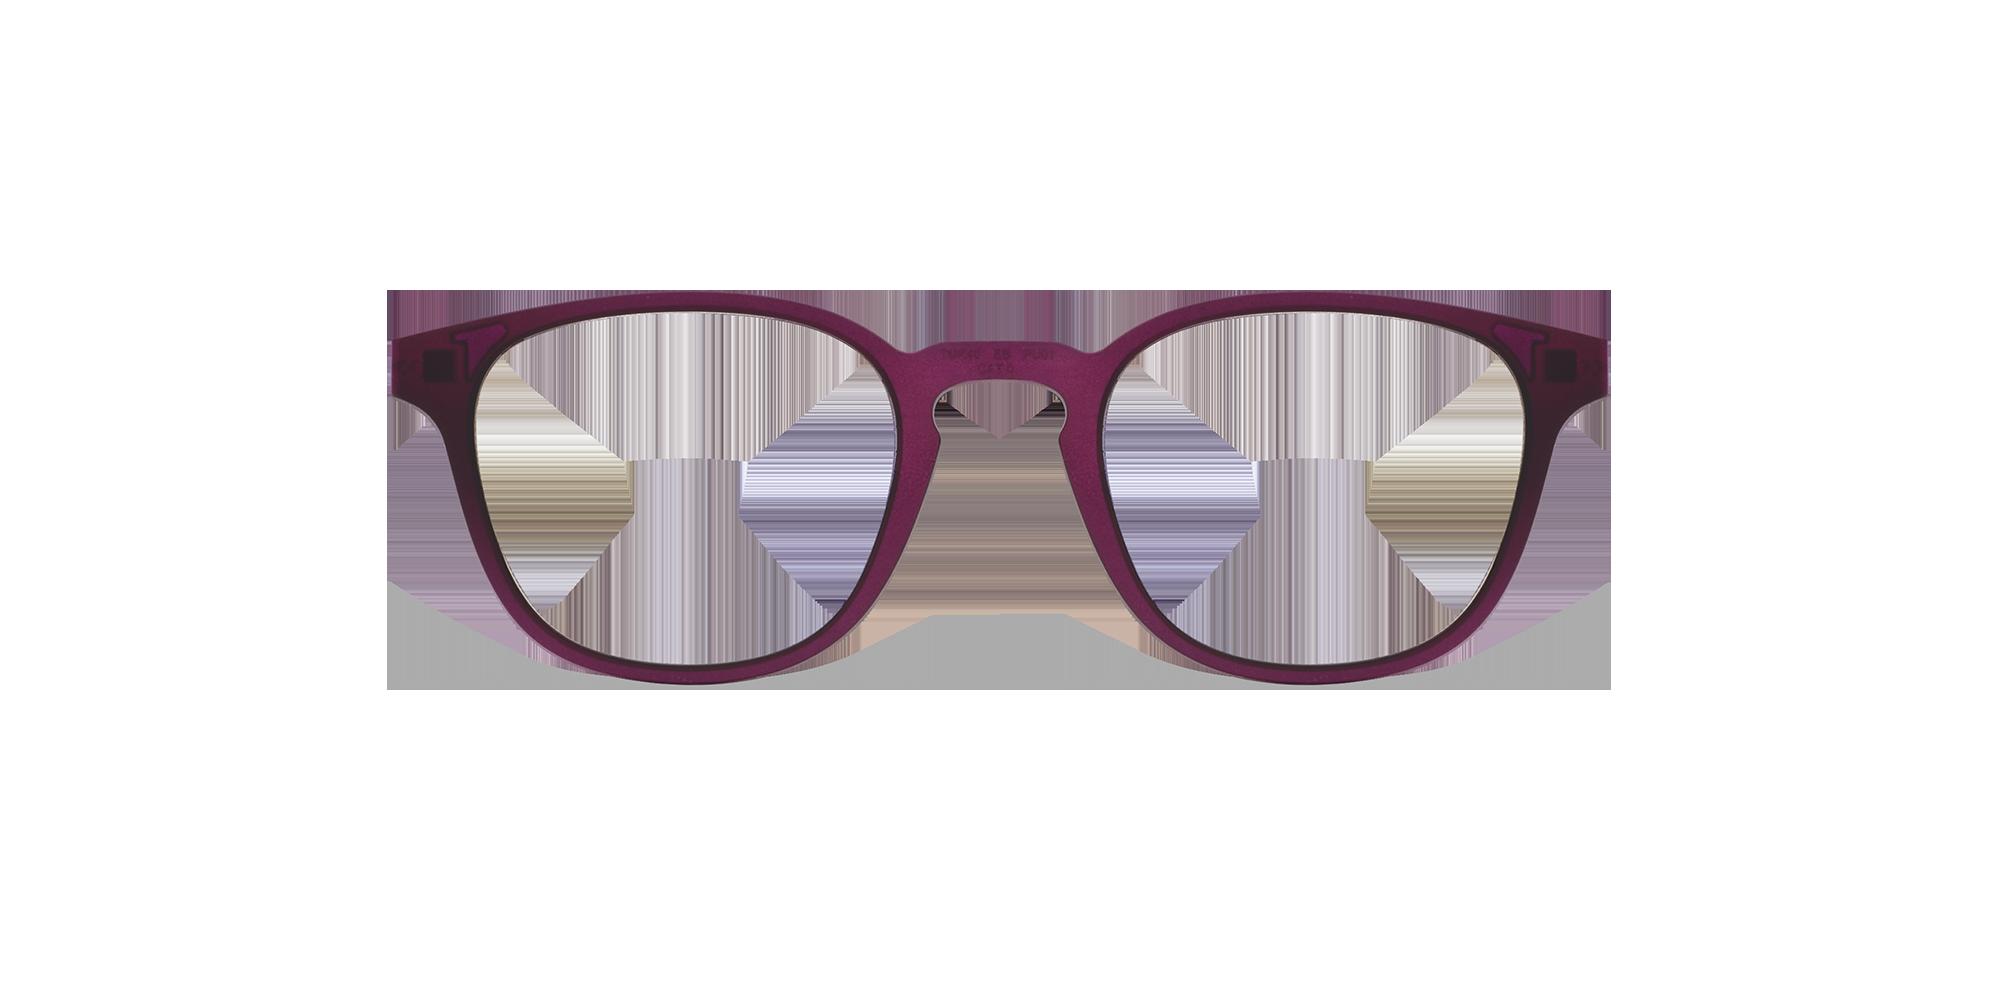 afflelou/france/products/smart_clip/clips_glasses/07630036429211_face.png